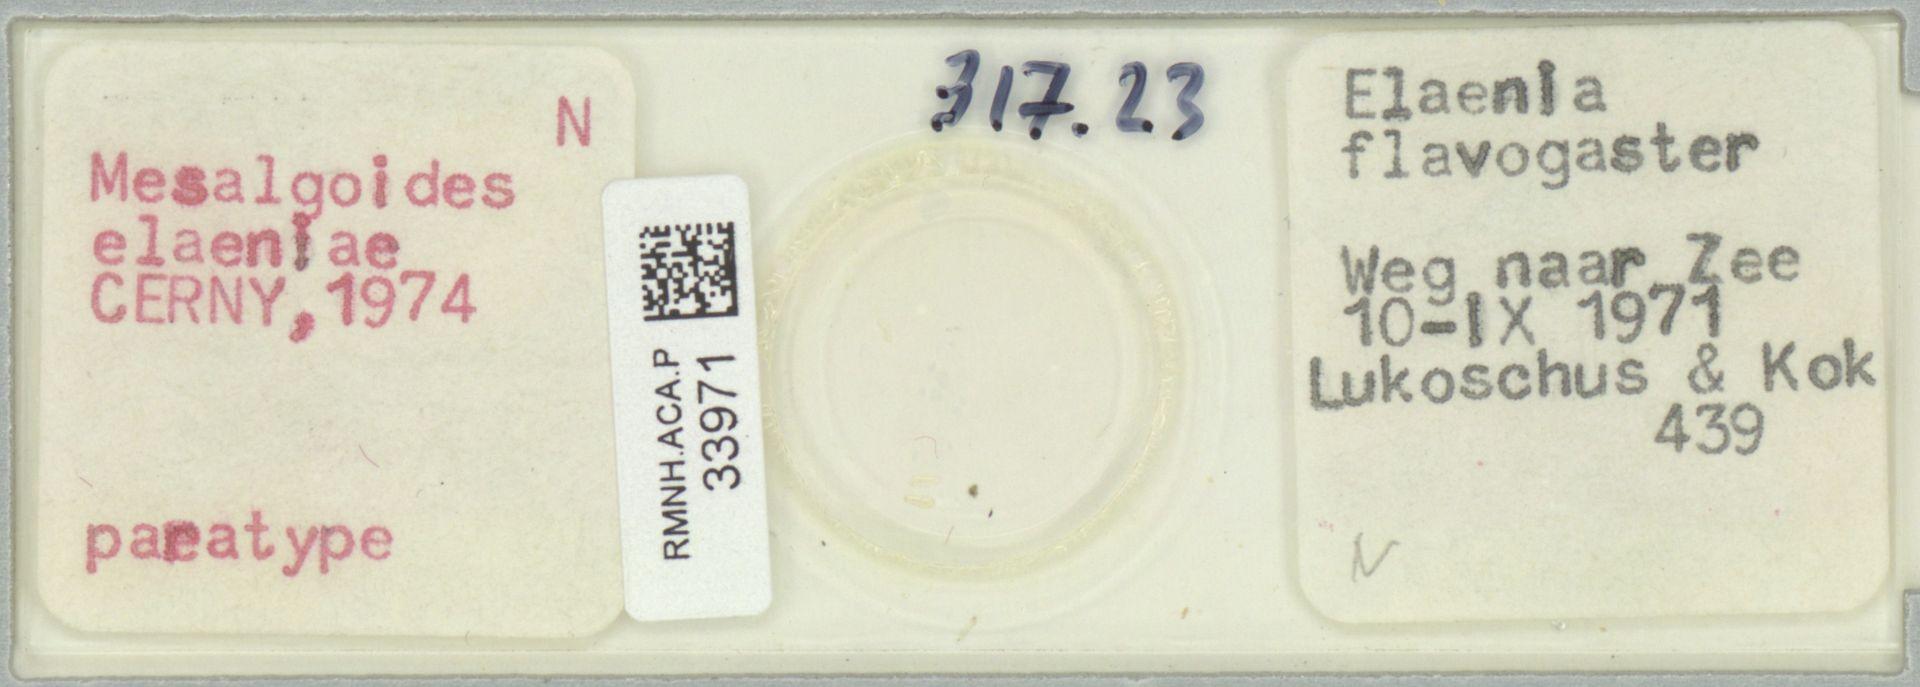 RMNH.ACA.P.33971   Mesalgoides elaeniae CERNY,1974